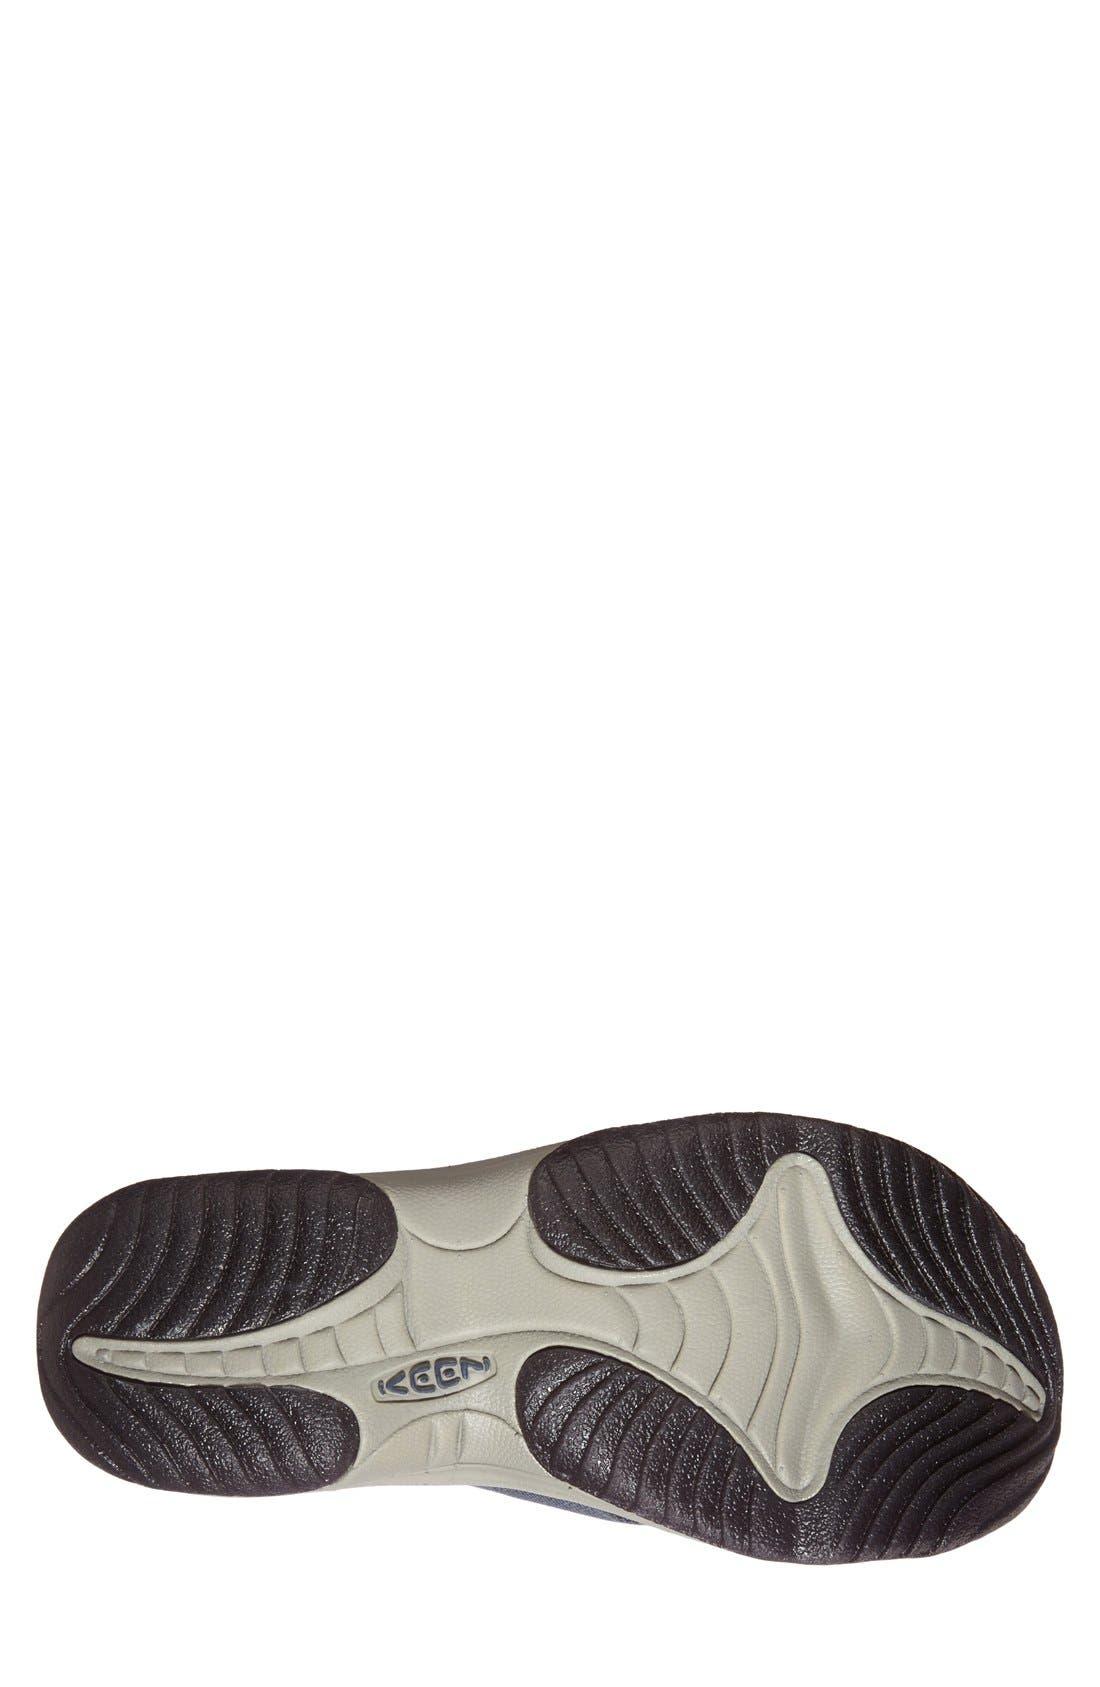 'Waimea H2' Water Thong Sandal,                             Alternate thumbnail 4, color,                             MIDNIGHT NAVY/ NEUTRAL